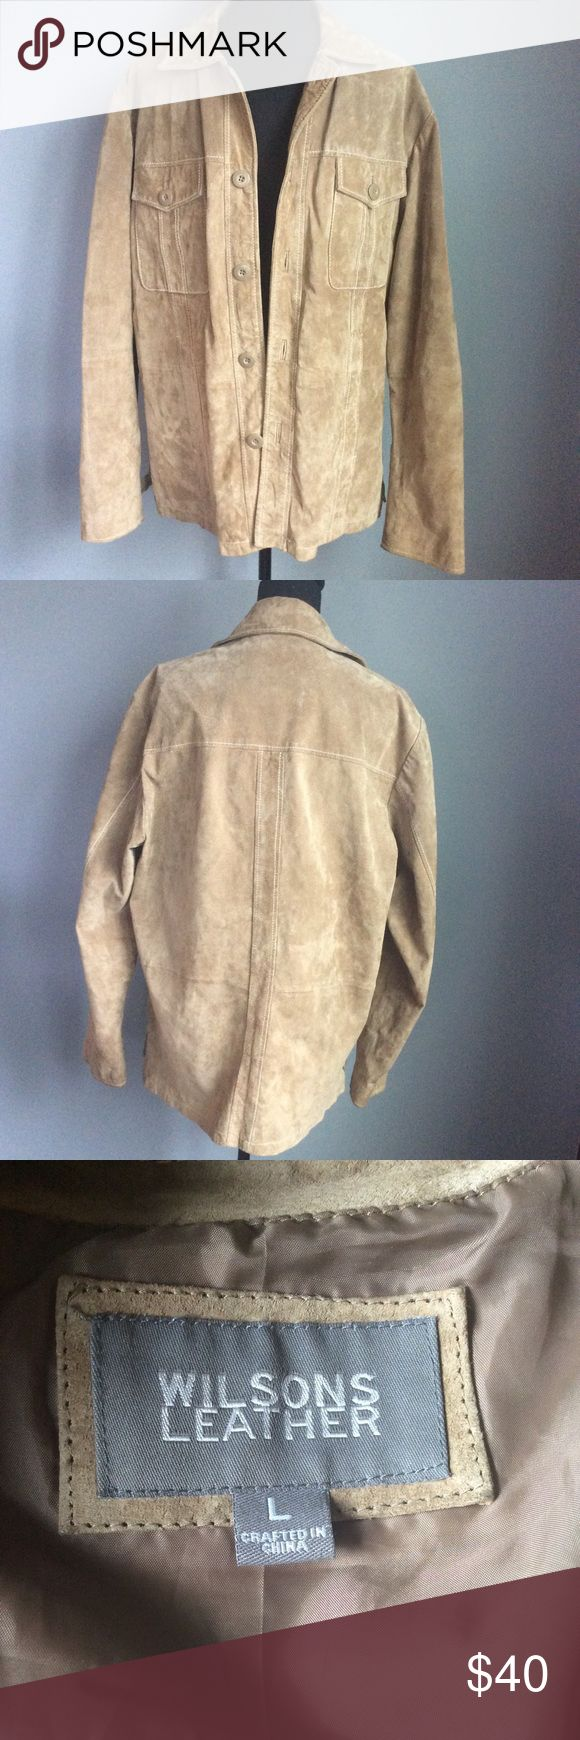 Vintage, Wilson's Leather, Suede Jacket Suede jacket